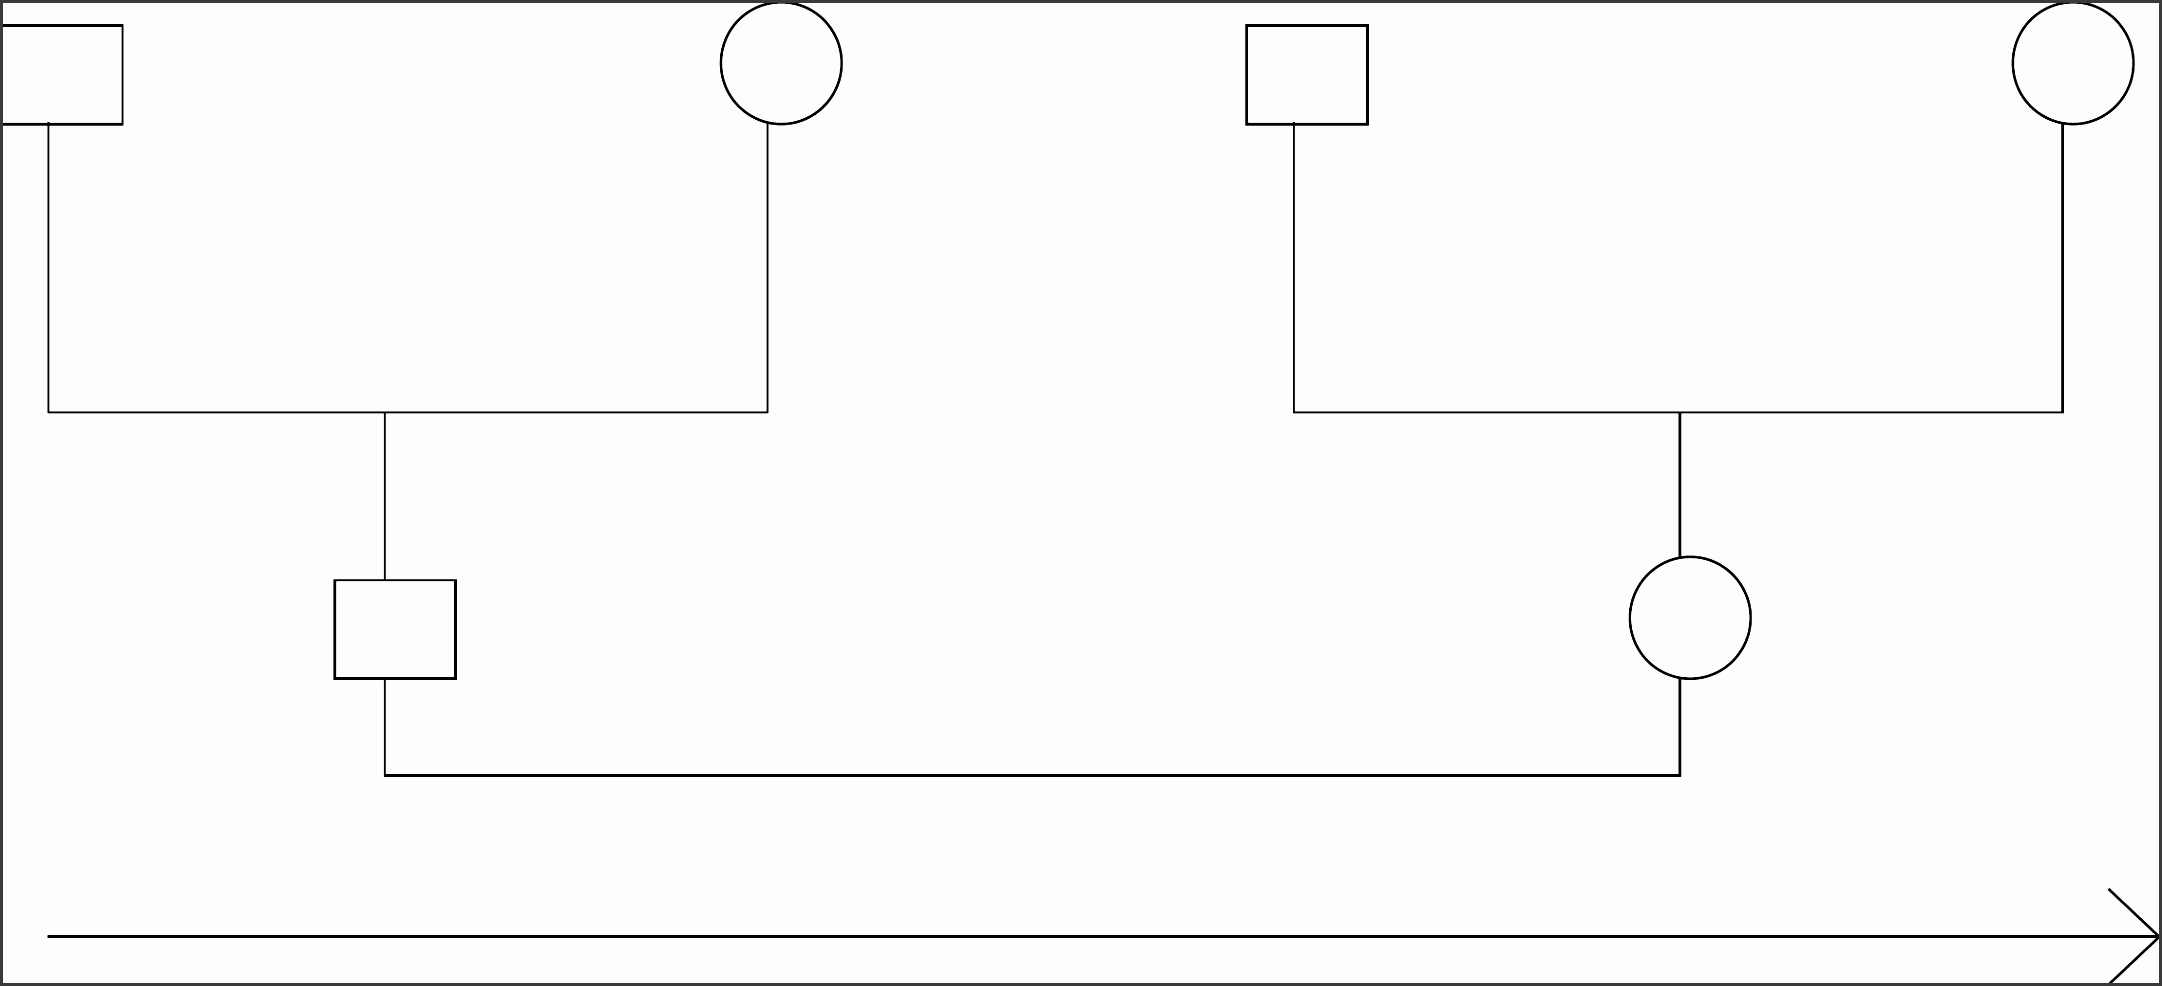 new genogram template full size